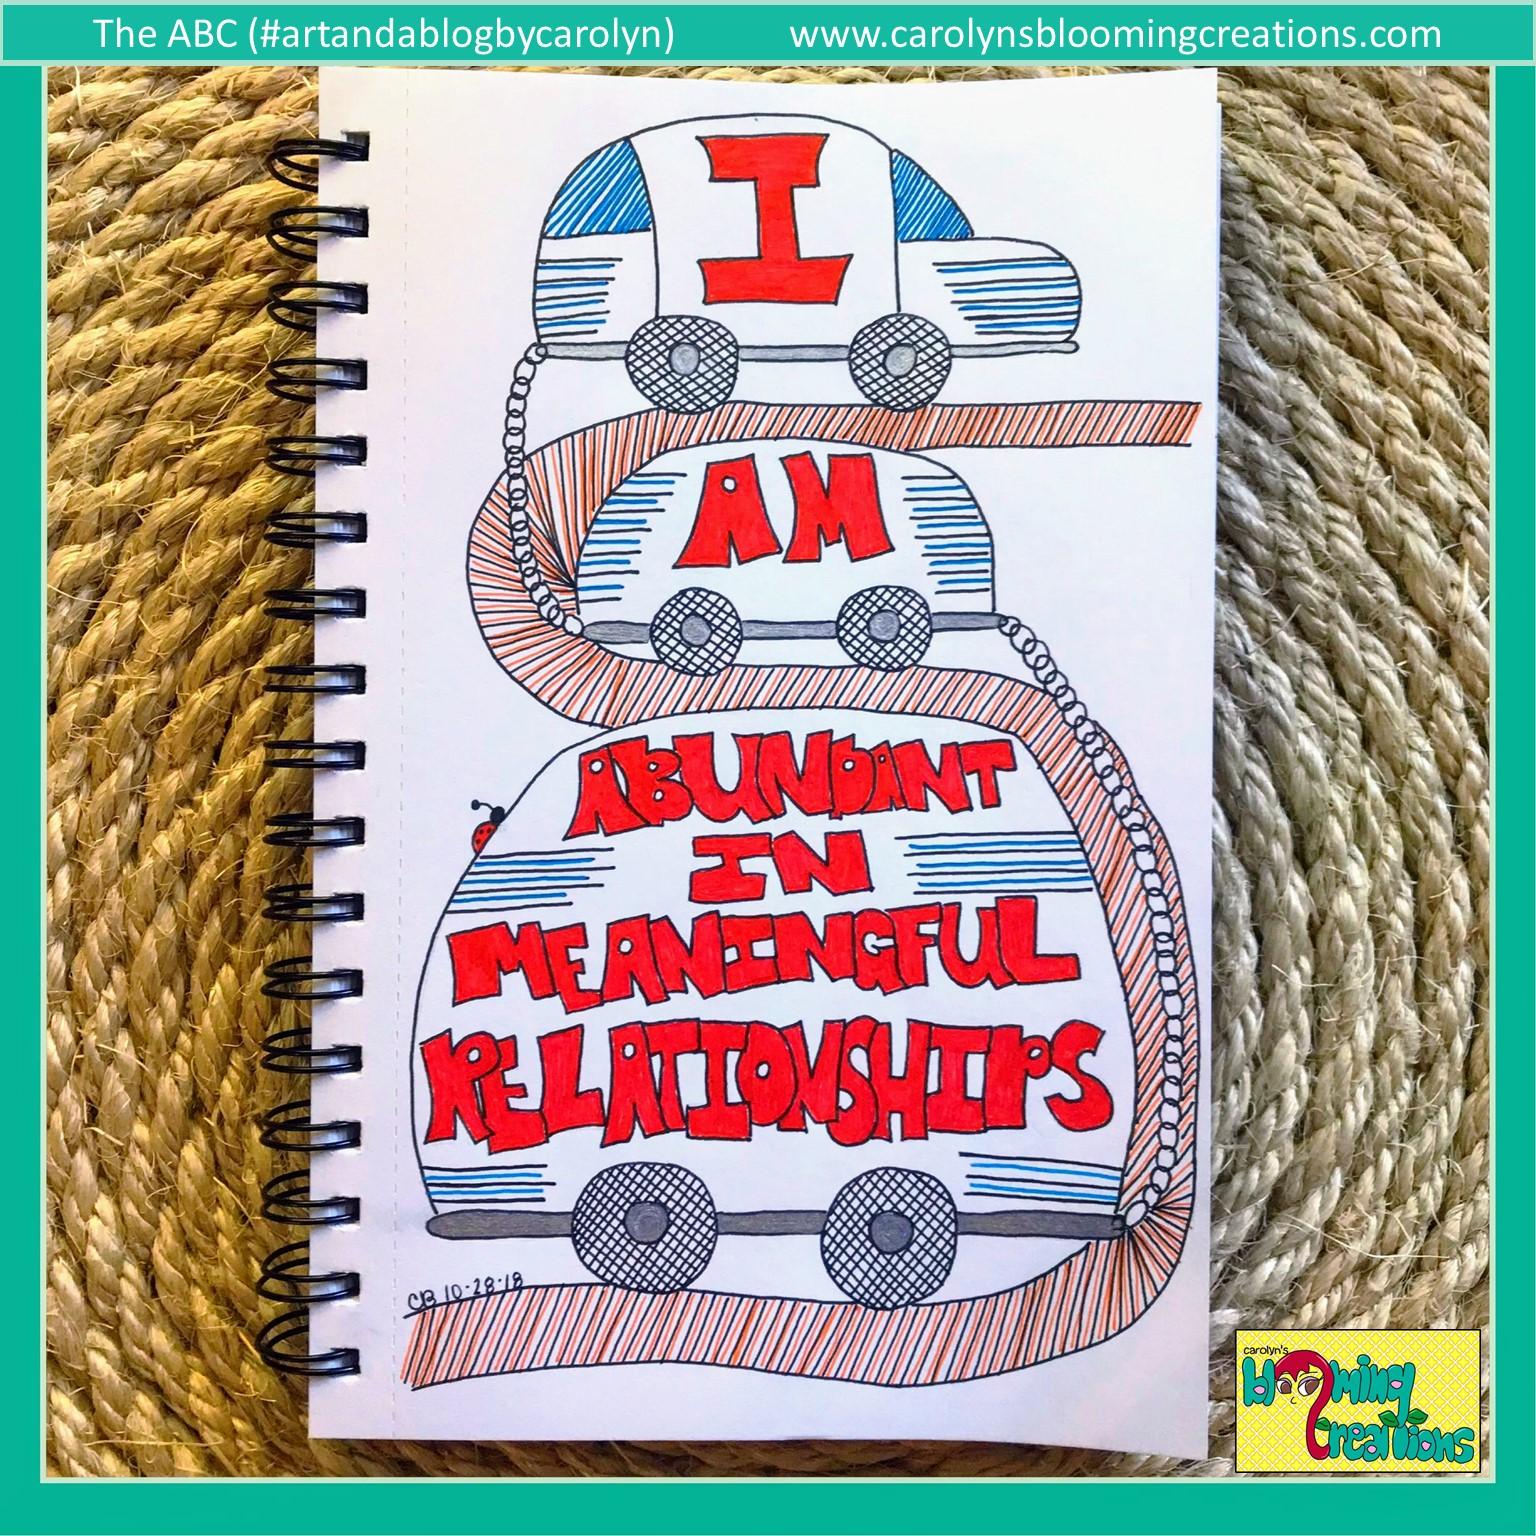 Carolyn Braden I am abundant in meaningful relationships.JPG